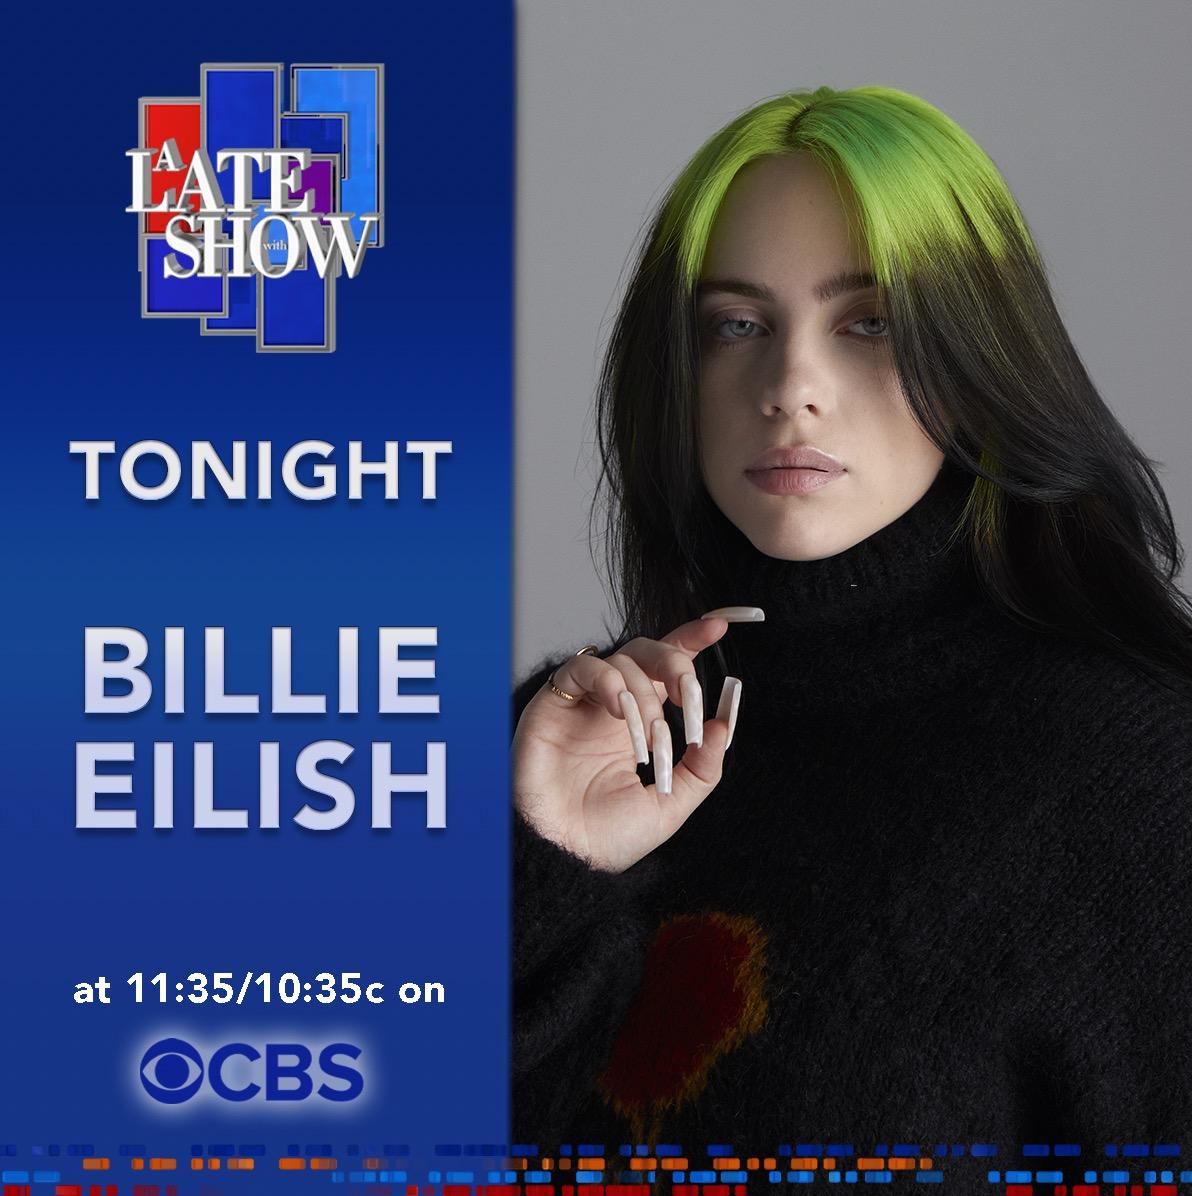 Watch Billie on @colbertlateshow tonight at 11:35/10:35c.